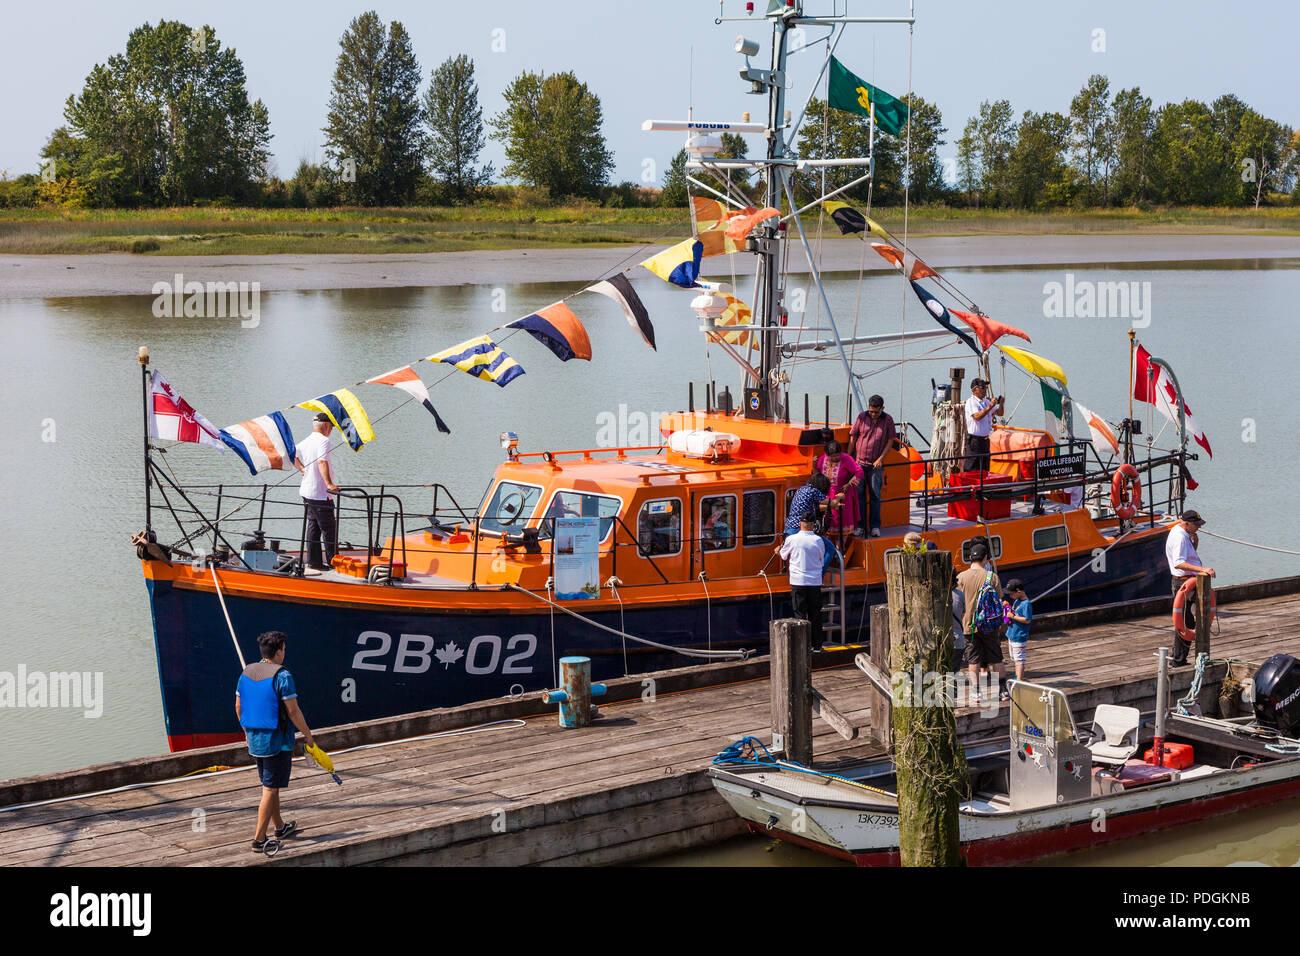 Steveston Lifeboat 2B-02 on display at the 2018 Steveston Maritime Festival - Stock Image